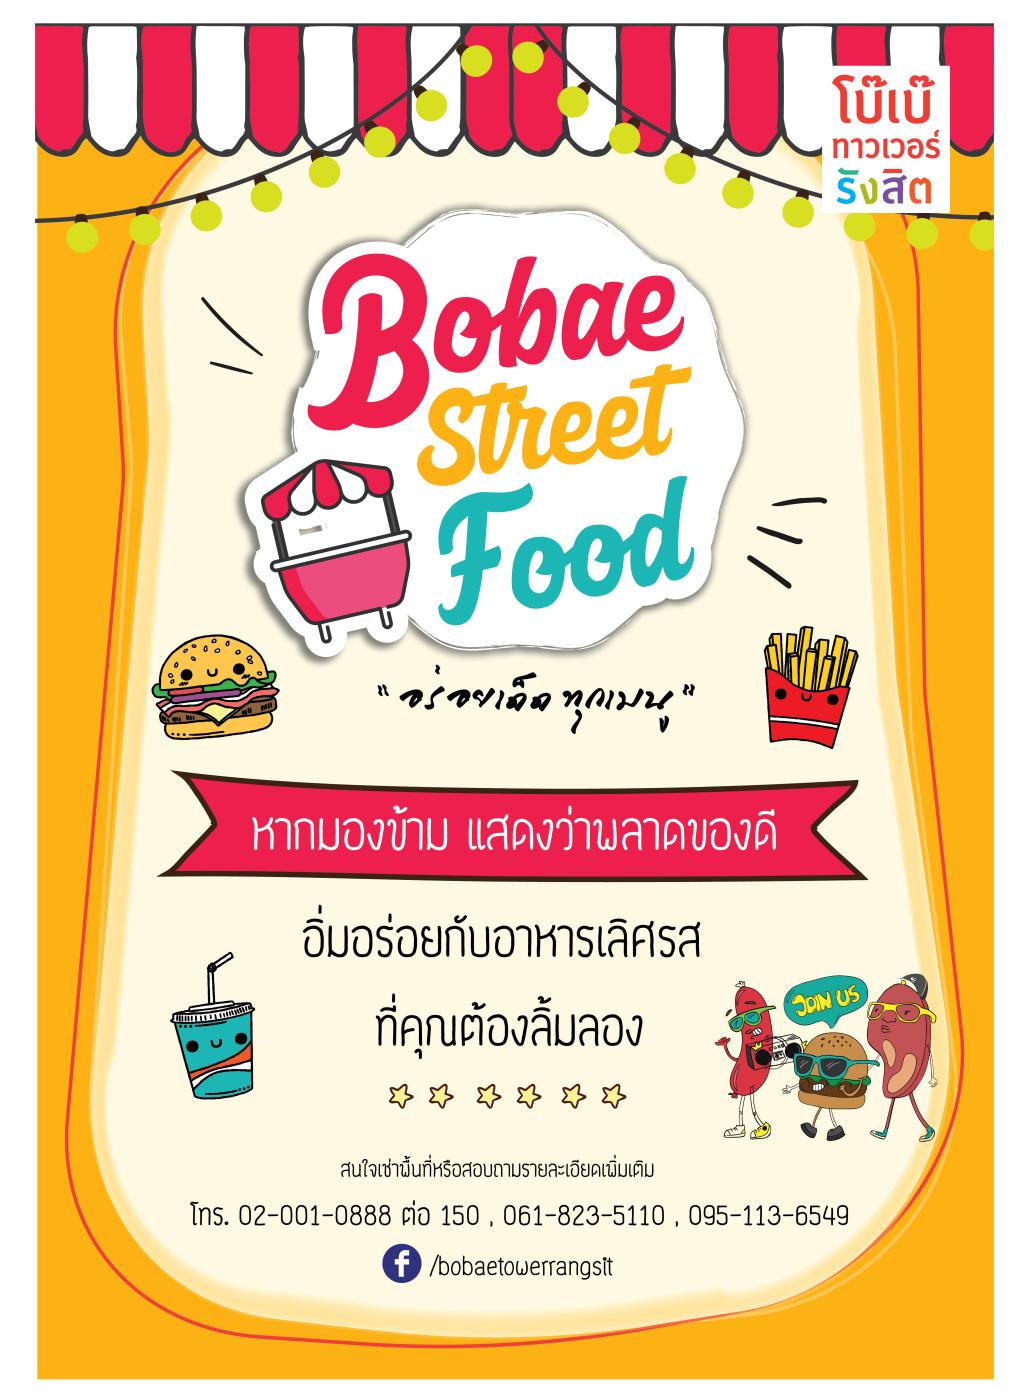 Bobae Street Food